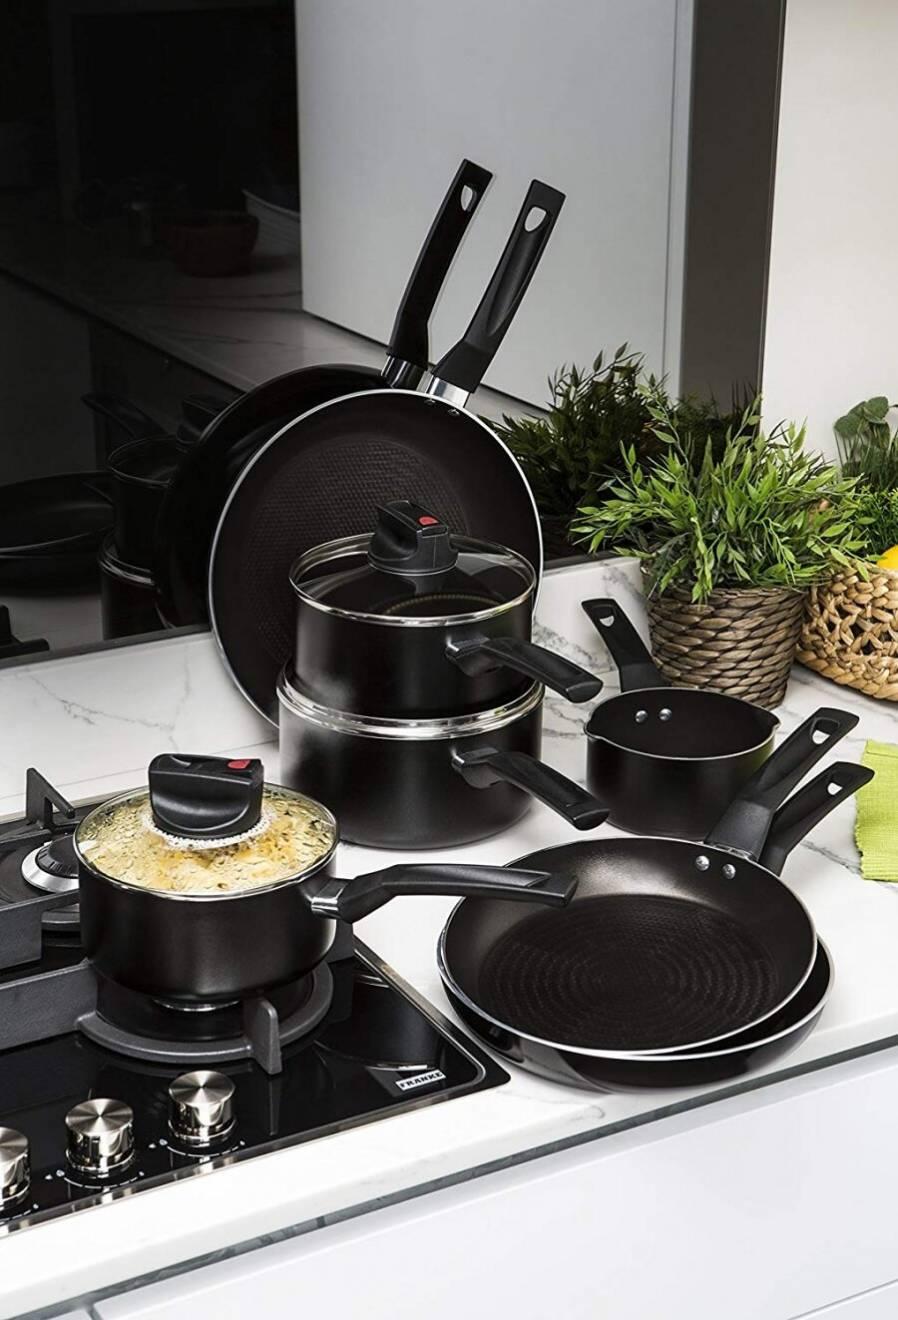 Prestige Safe Cook Aluminium 3 PCs Saucepan Set With Lid - 16/18/20 cm